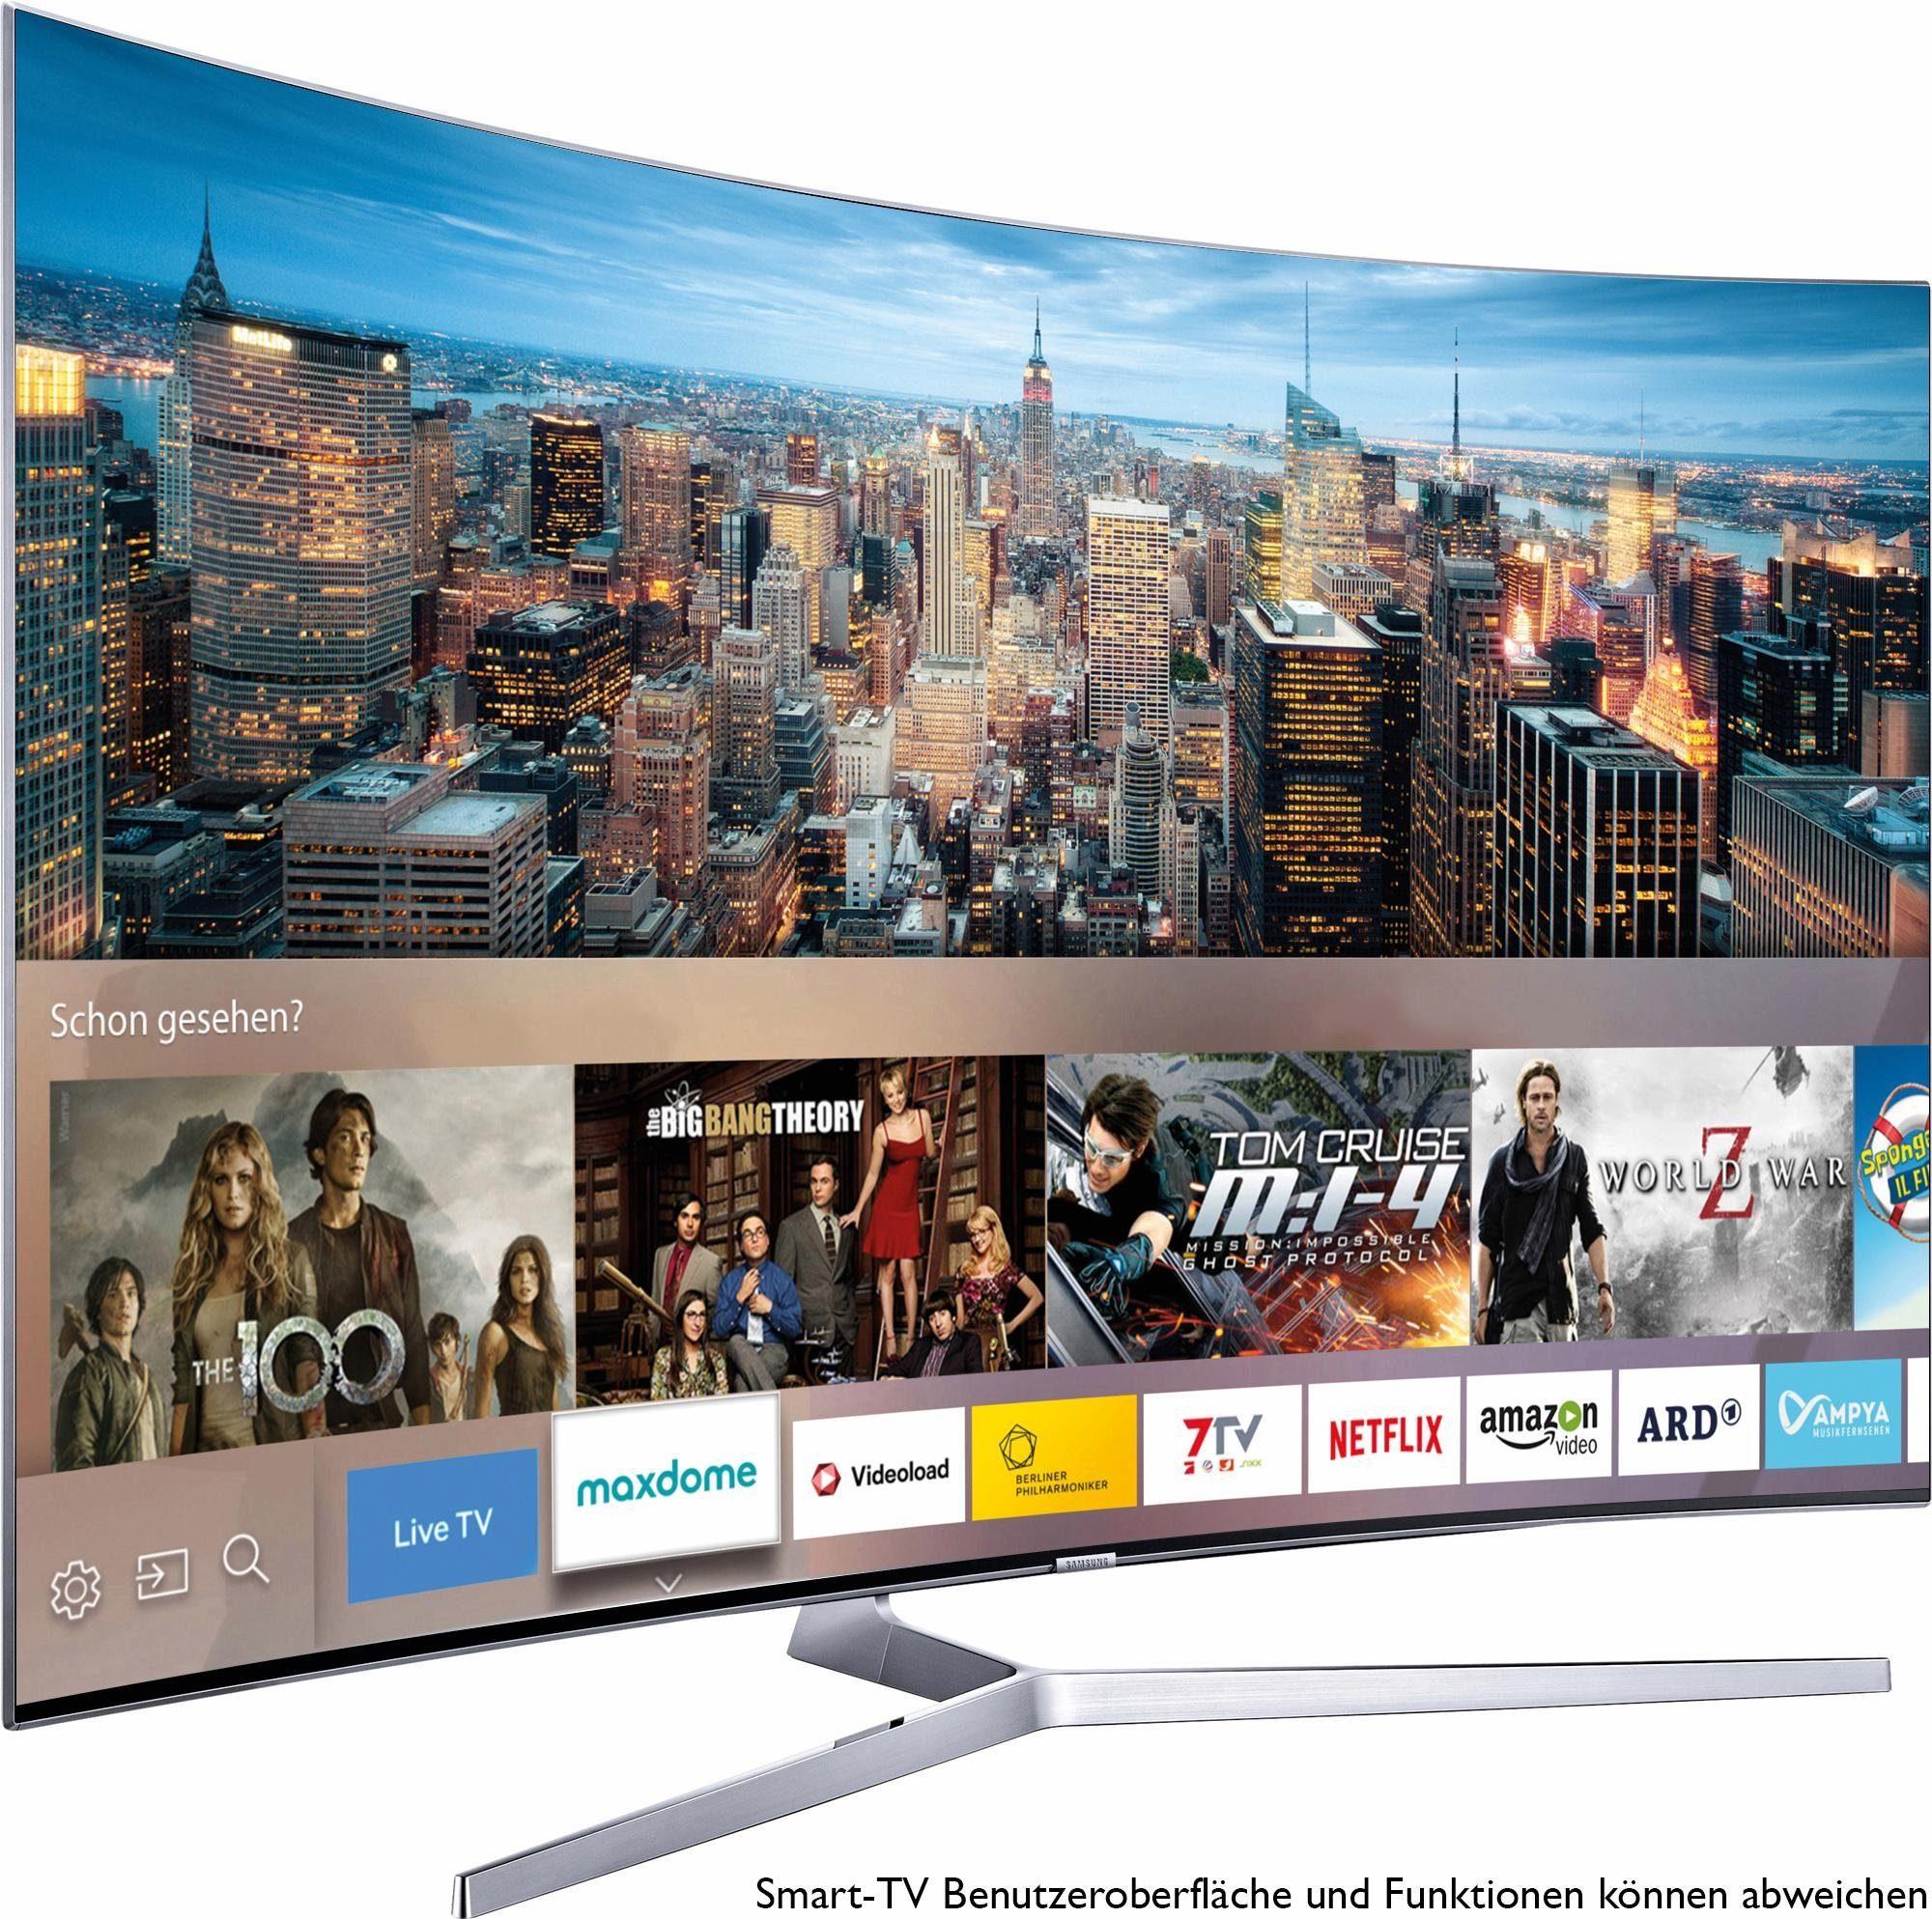 Samsung UE55KS9090TXZG, Curved-LED-Fernseher, 138 cm (55 Zoll), 2160p (SUHD), Smart-TV